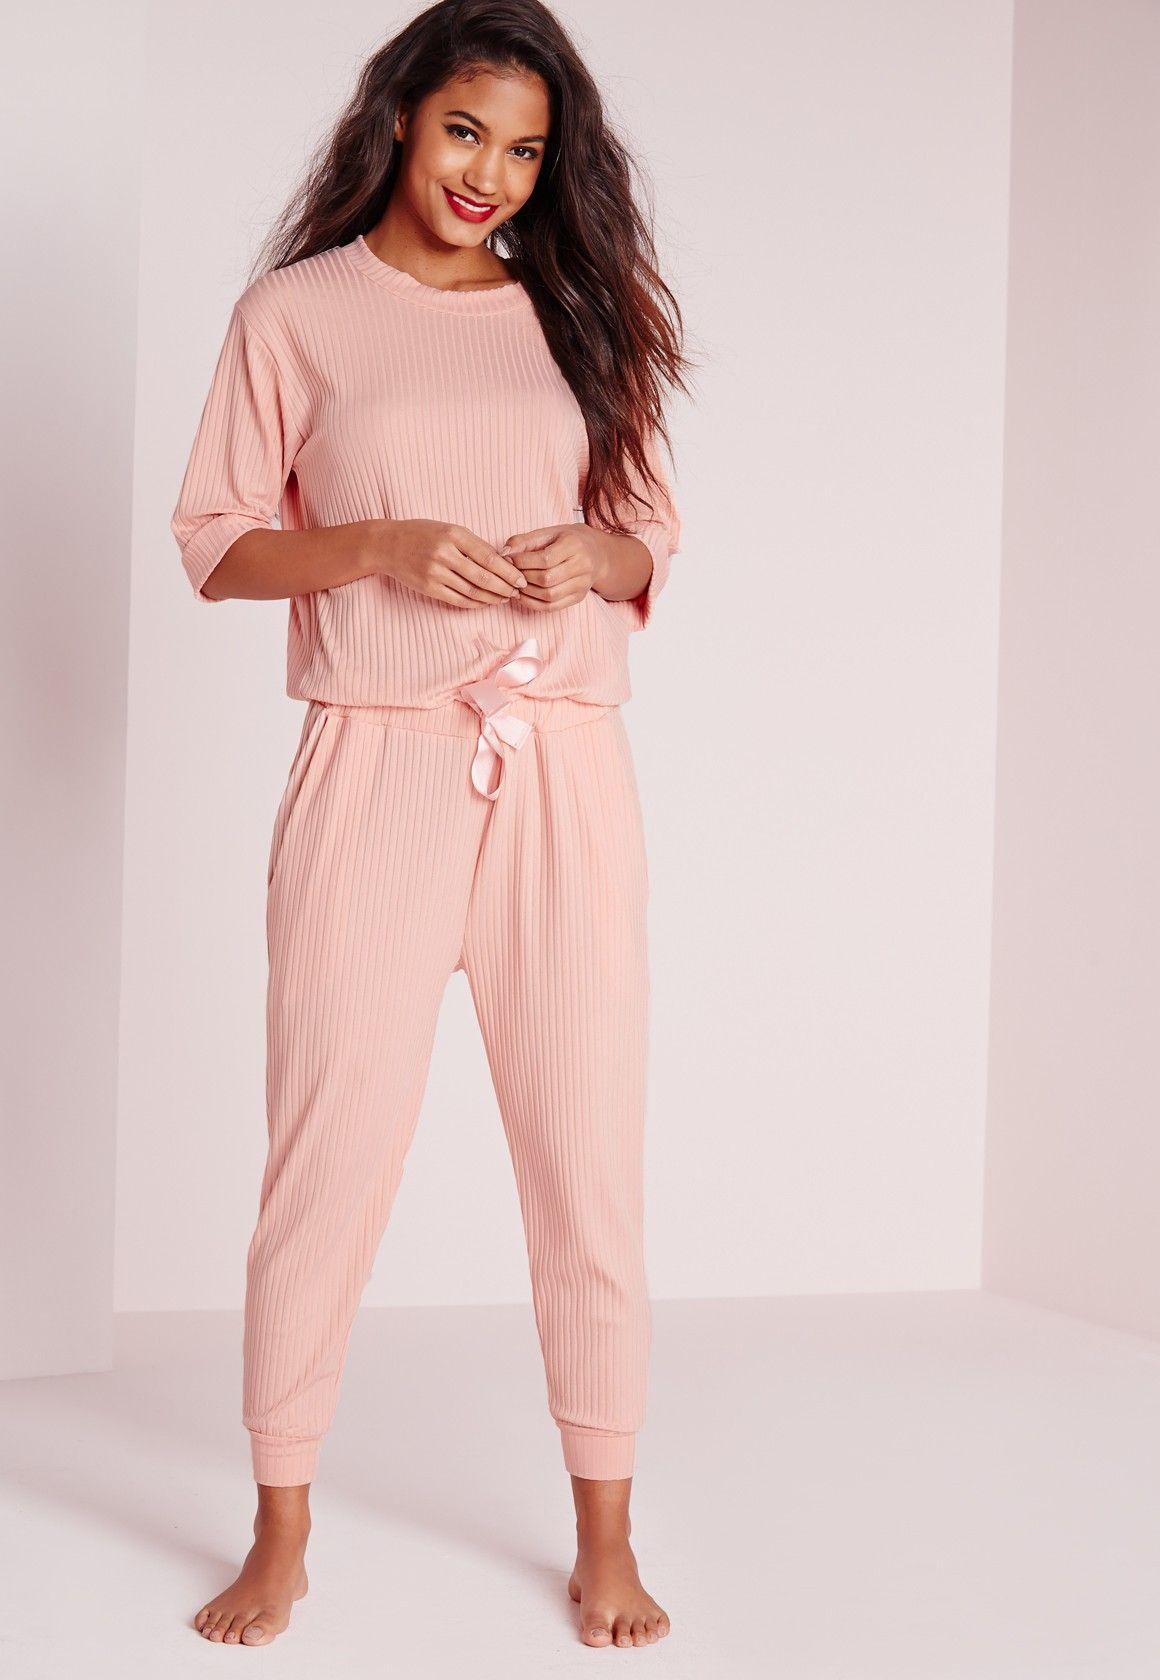 Heaven Shirt   DennisMaglic.com - Fashion Online   Shop now